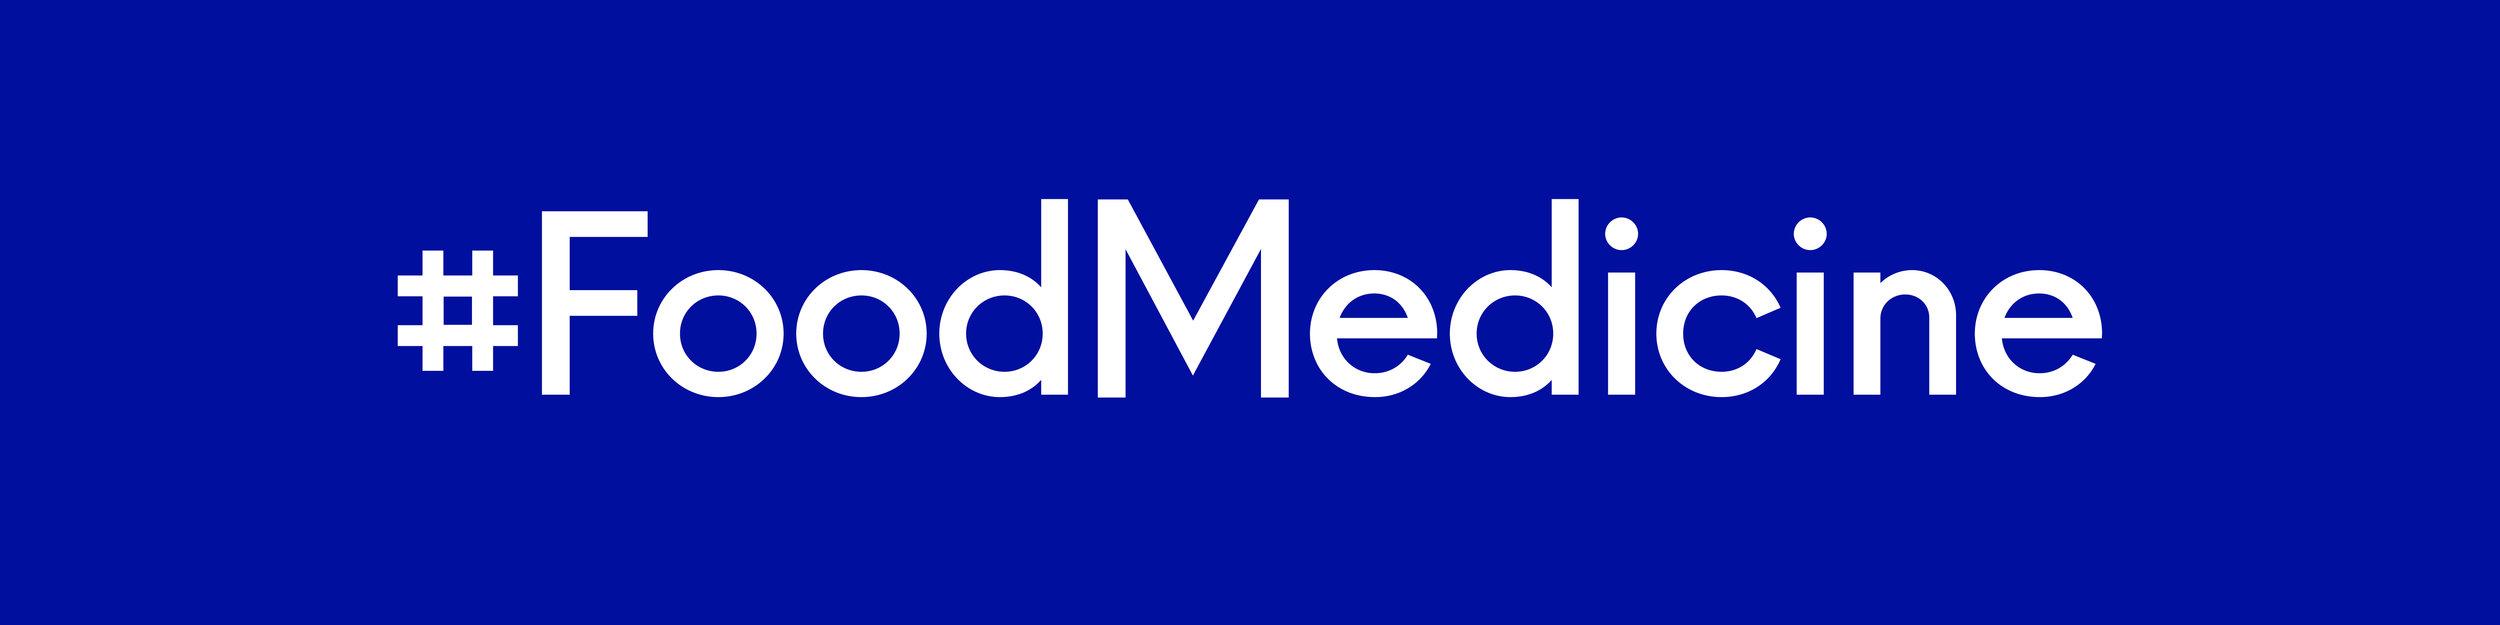 #FoodMedicine-01-01.jpg